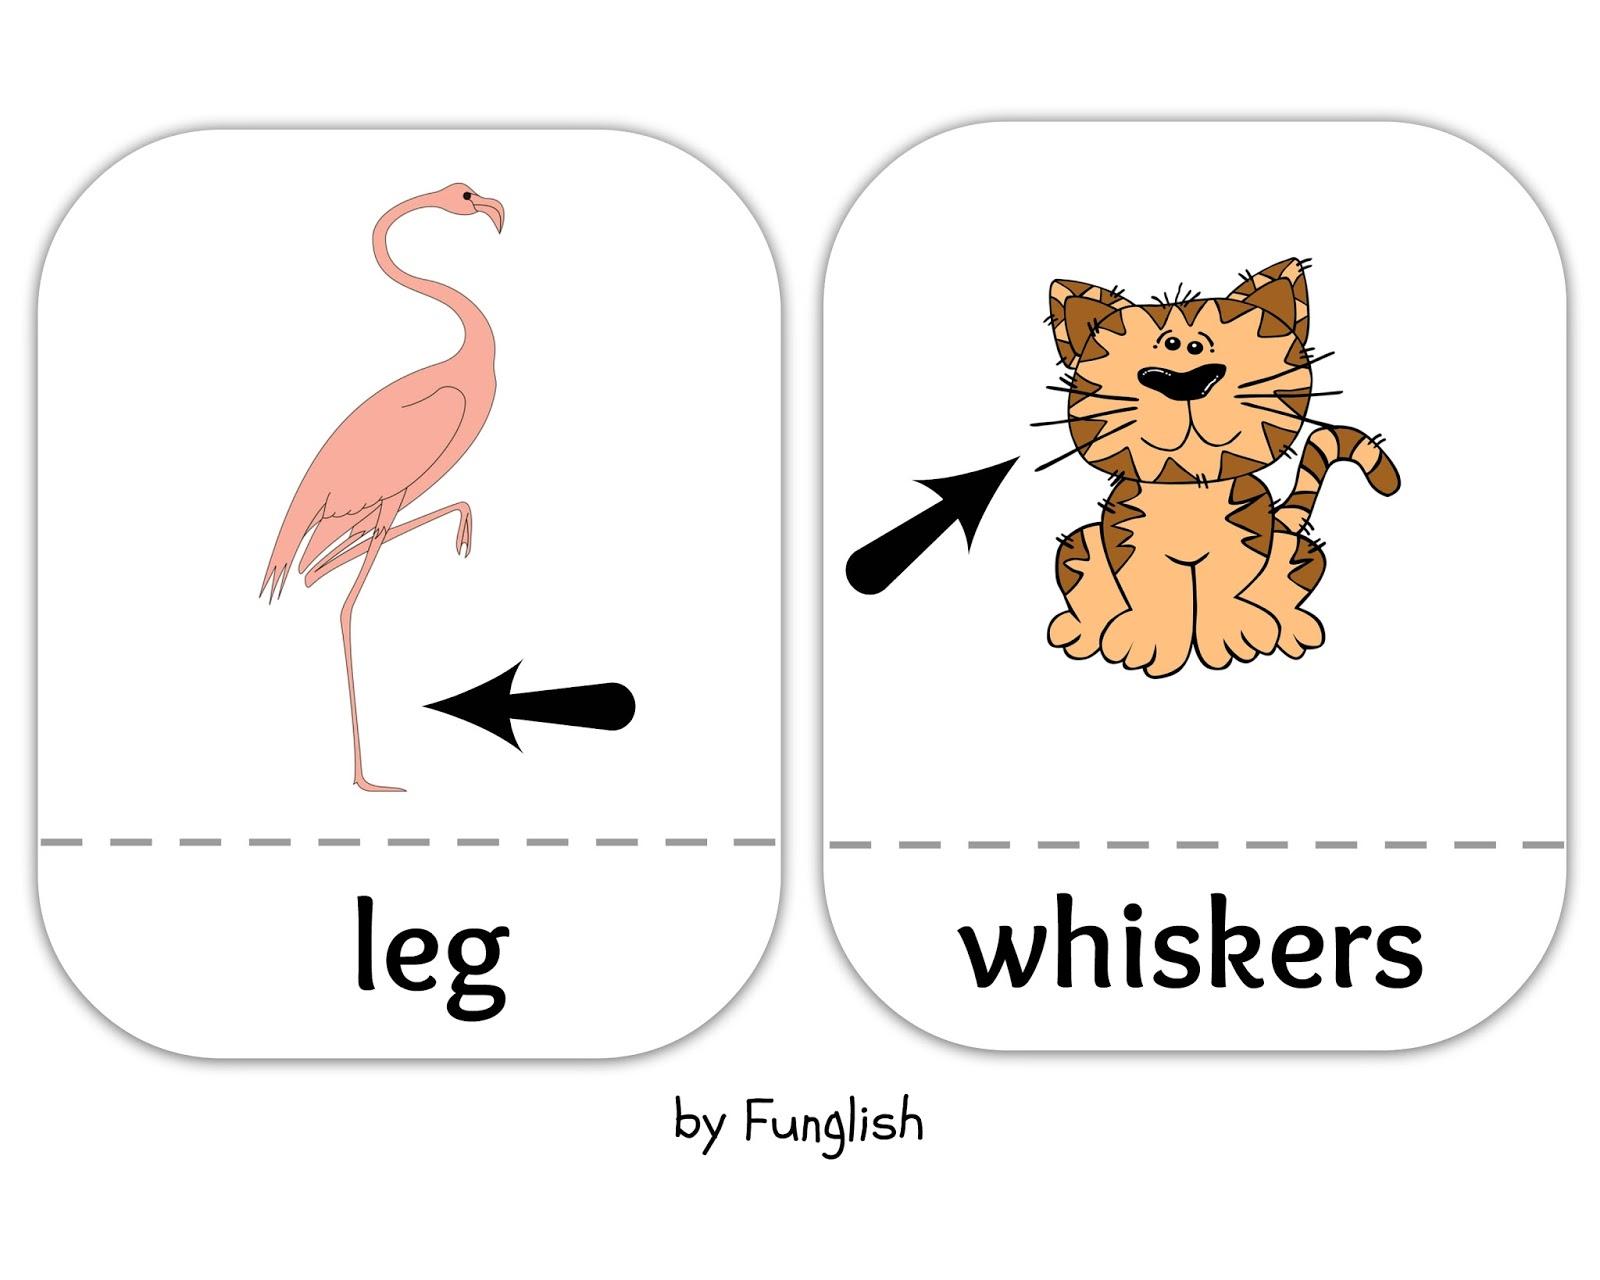 Funglish Animal Body Parts